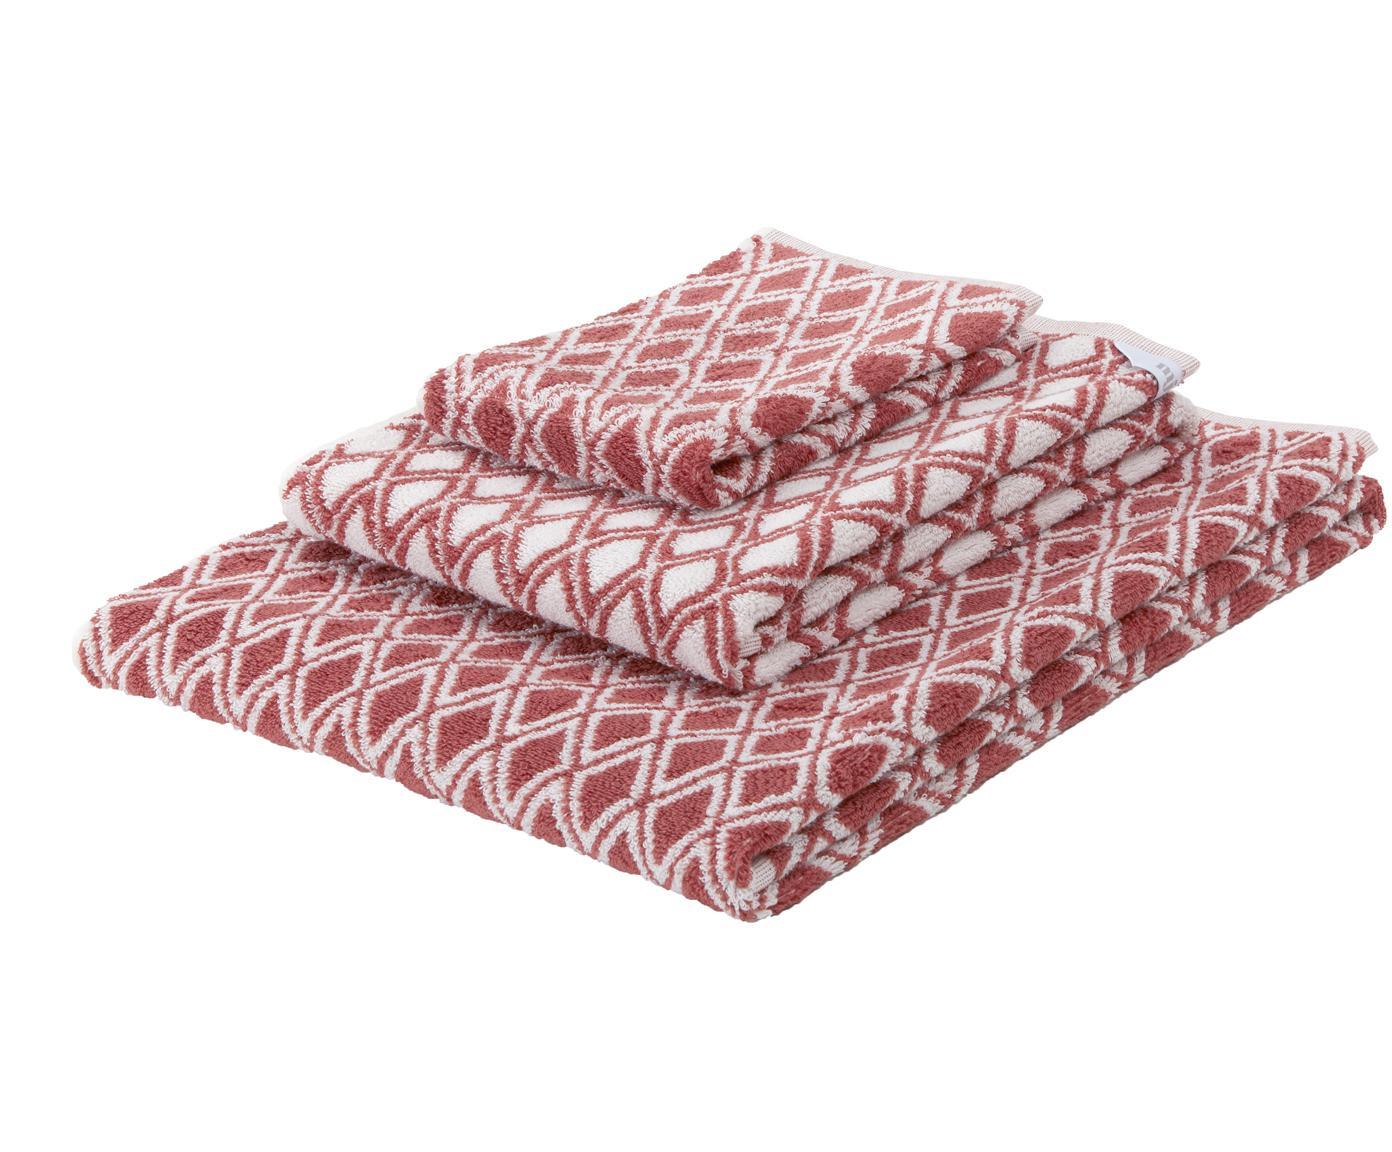 Set asciugamani reversibili Ava, 3 pz., 100% cotone, qualità media 550g/m², Terracotta, bianco crema, Diverse dimensioni